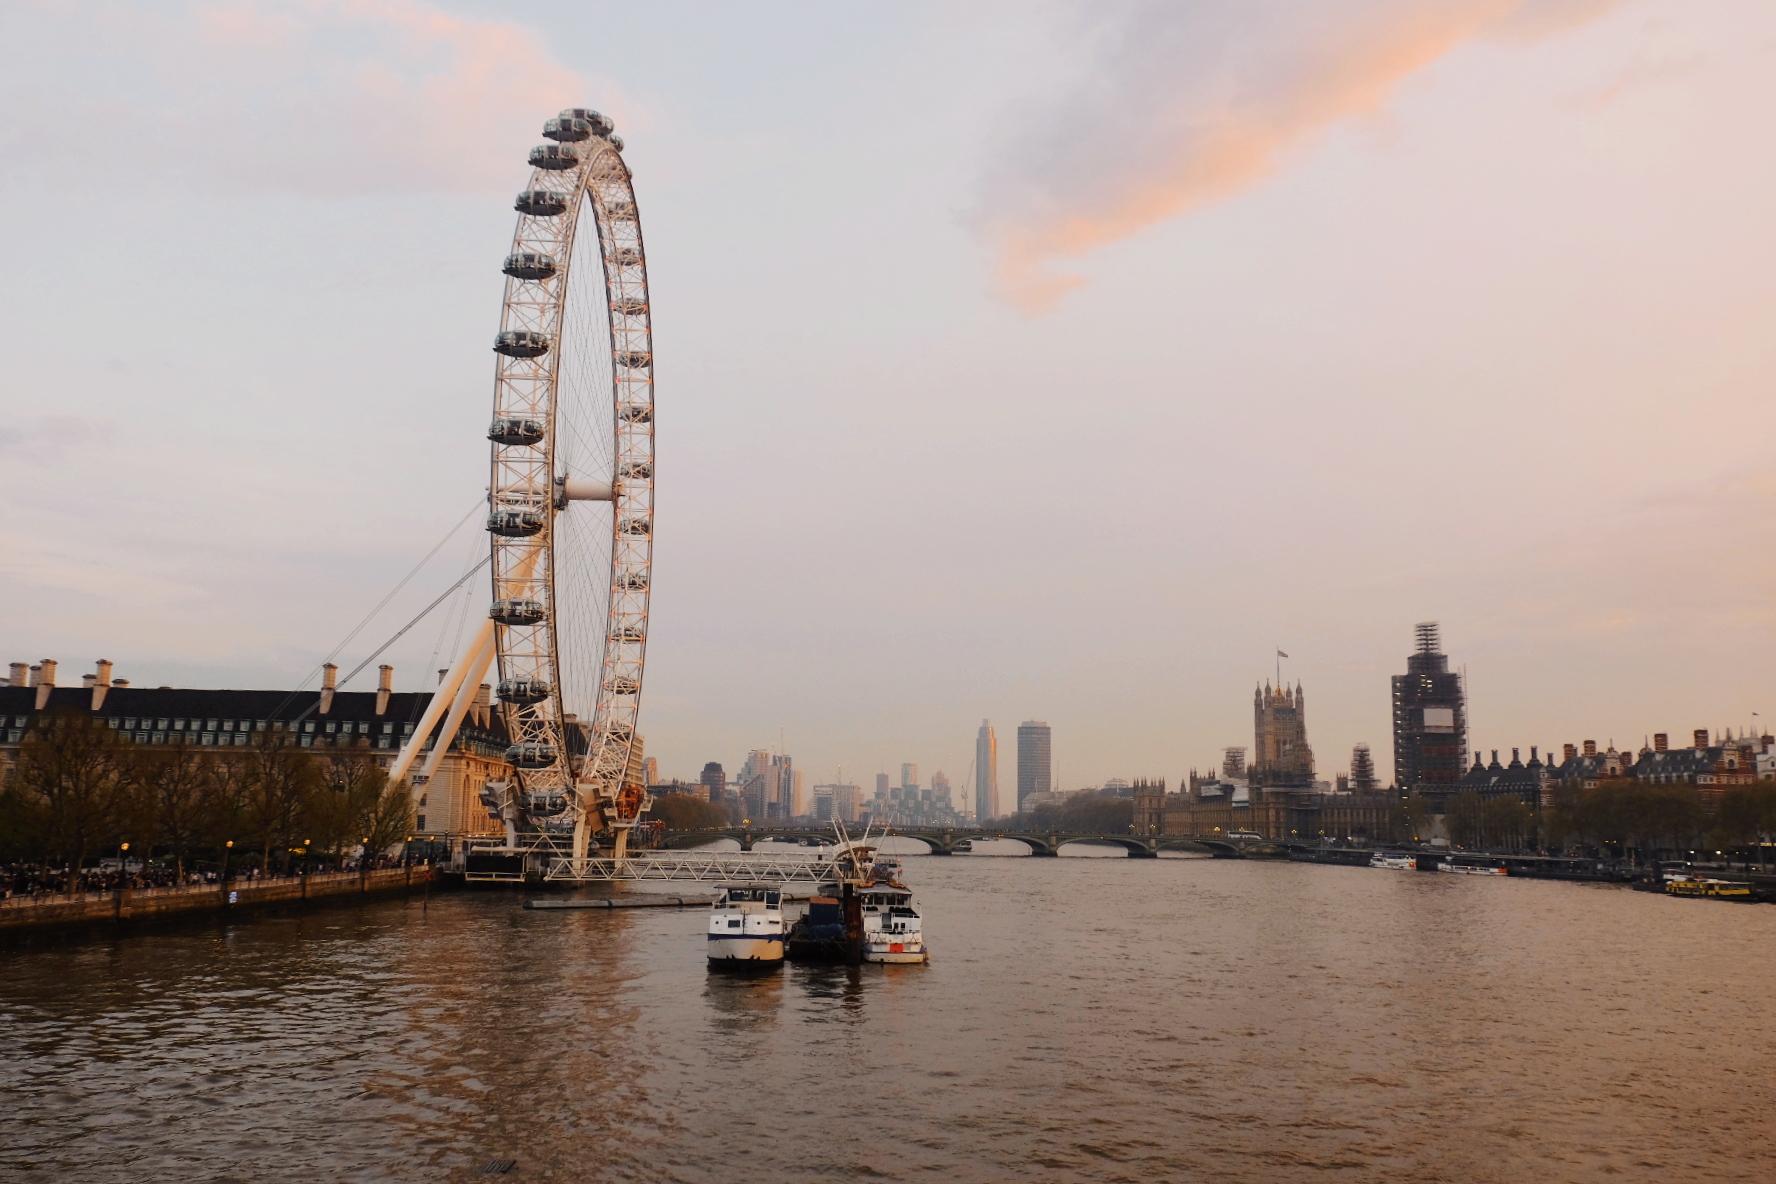 Londres - London - London Eye